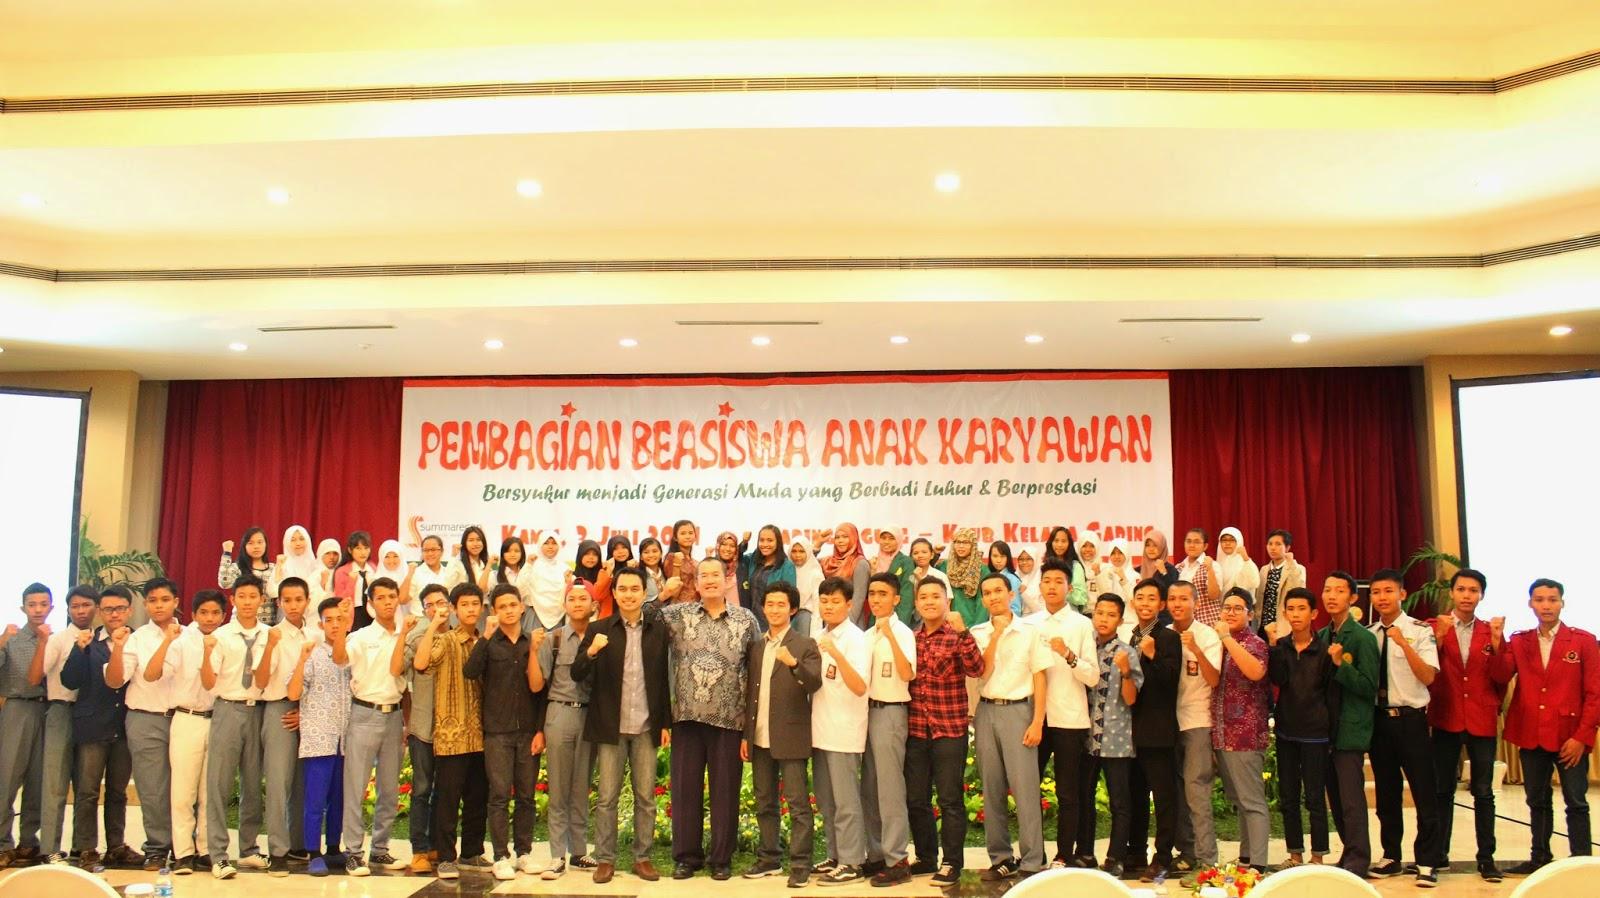 seminar wirausaha motivator nasional muda termuda indonesia pengusaha entrepreneur sukses training motivasi mahasiswa kampus inspirator